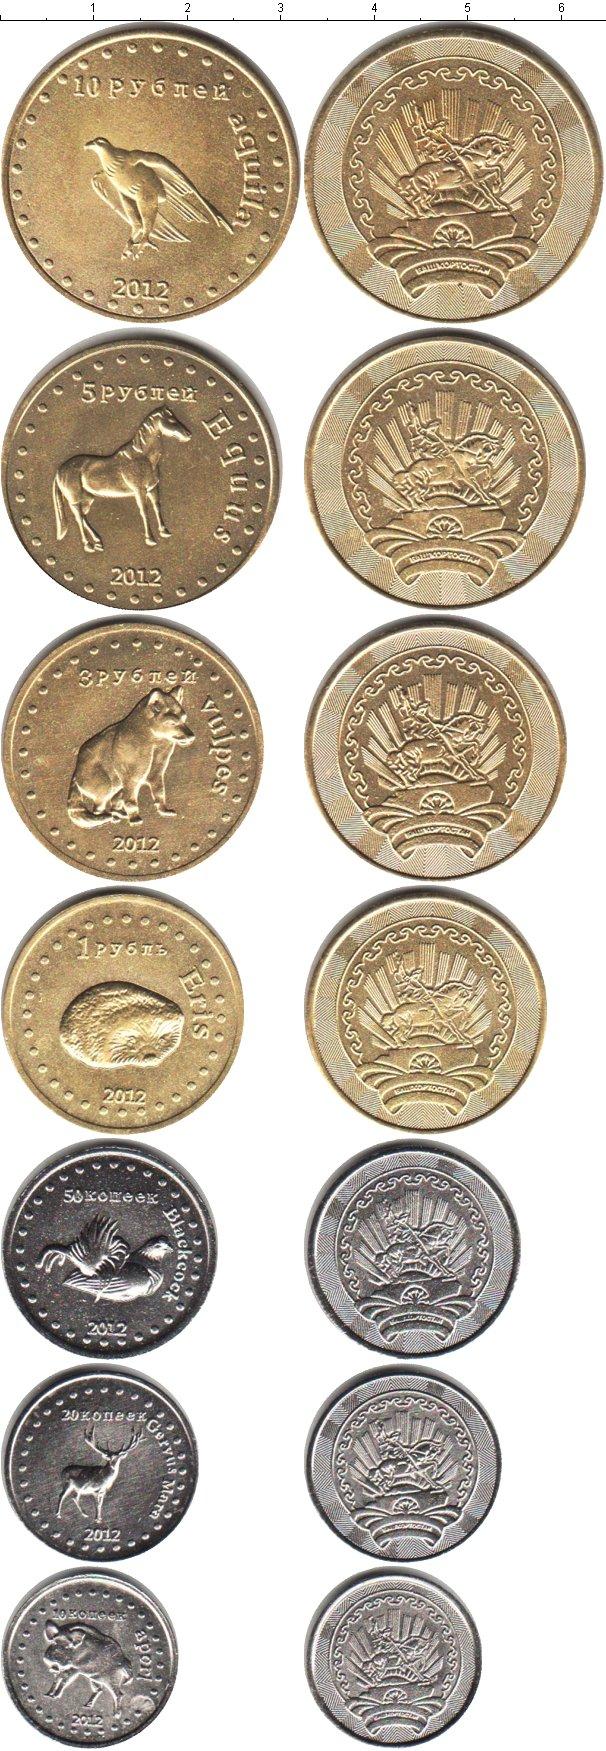 Картинка Наборы монет Башкортостан Башкортостан 2012  2012